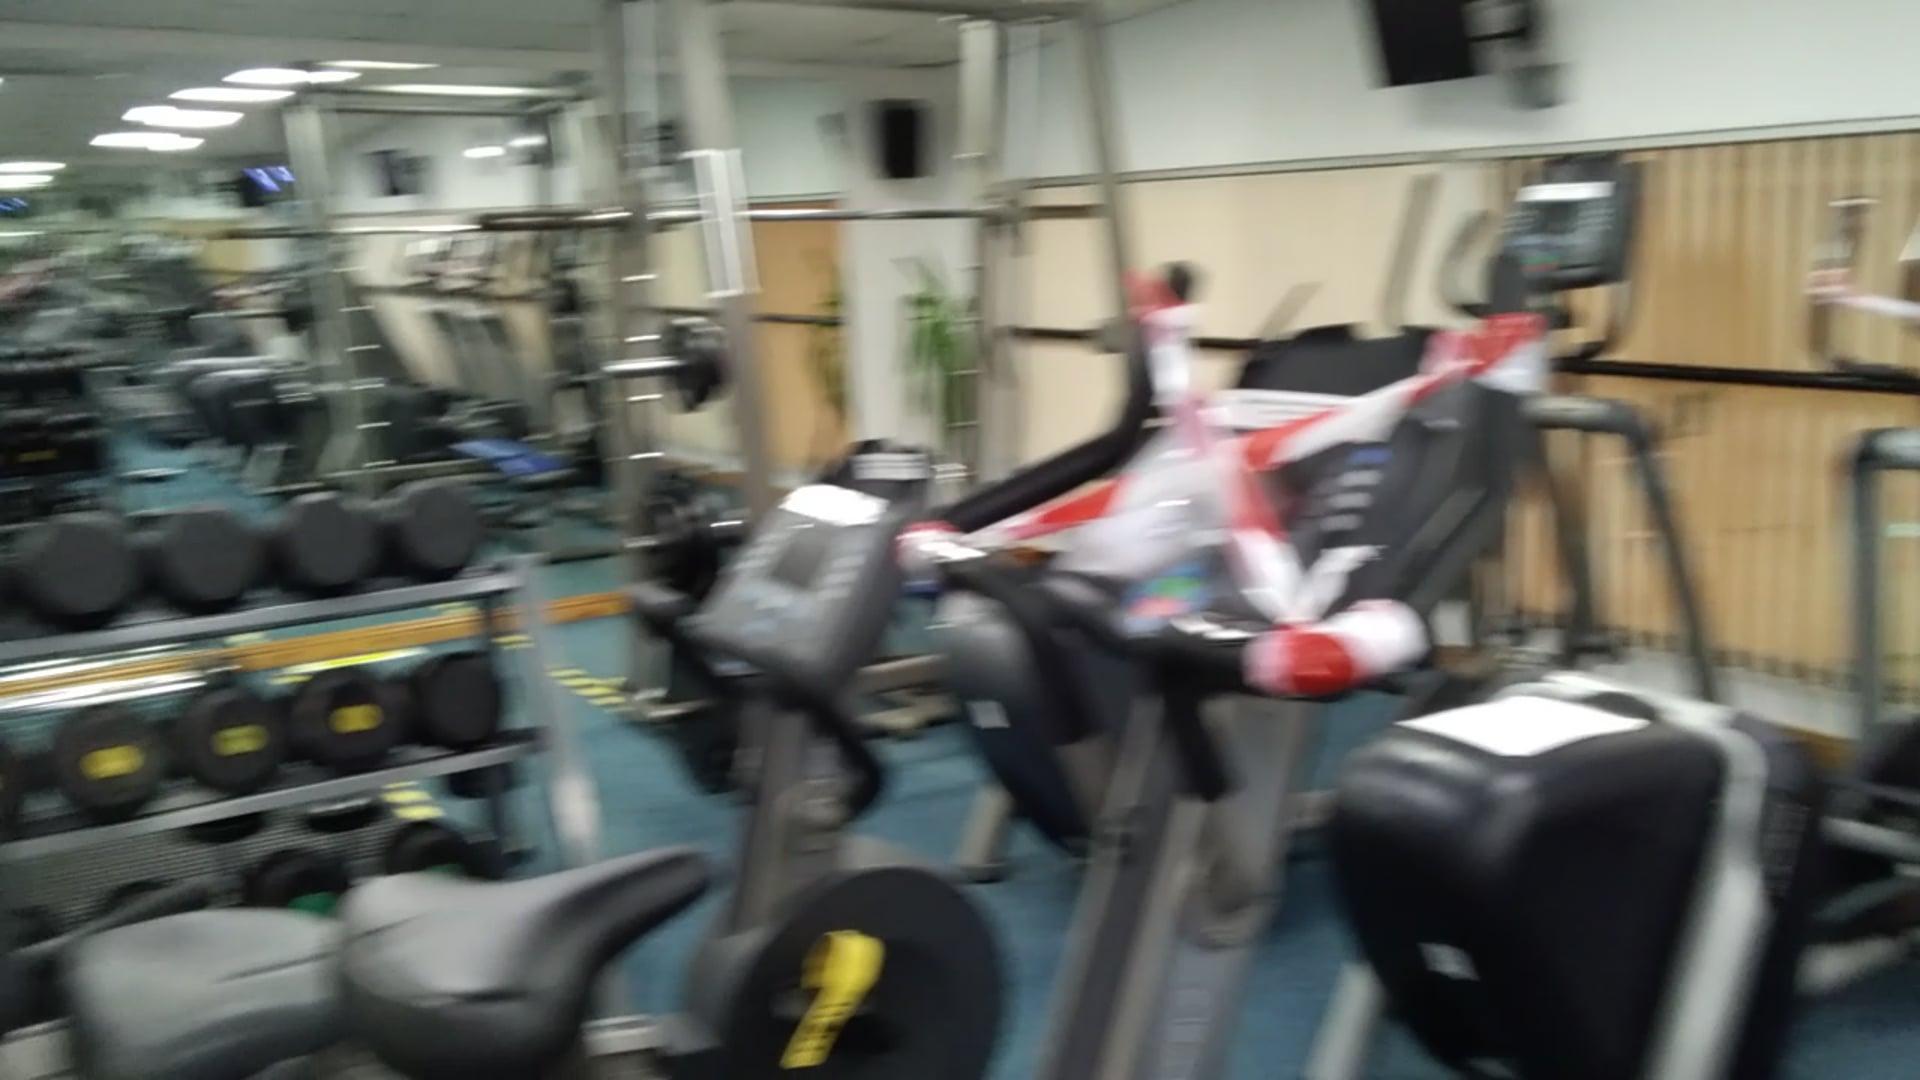 Corrib Gym new Protocols